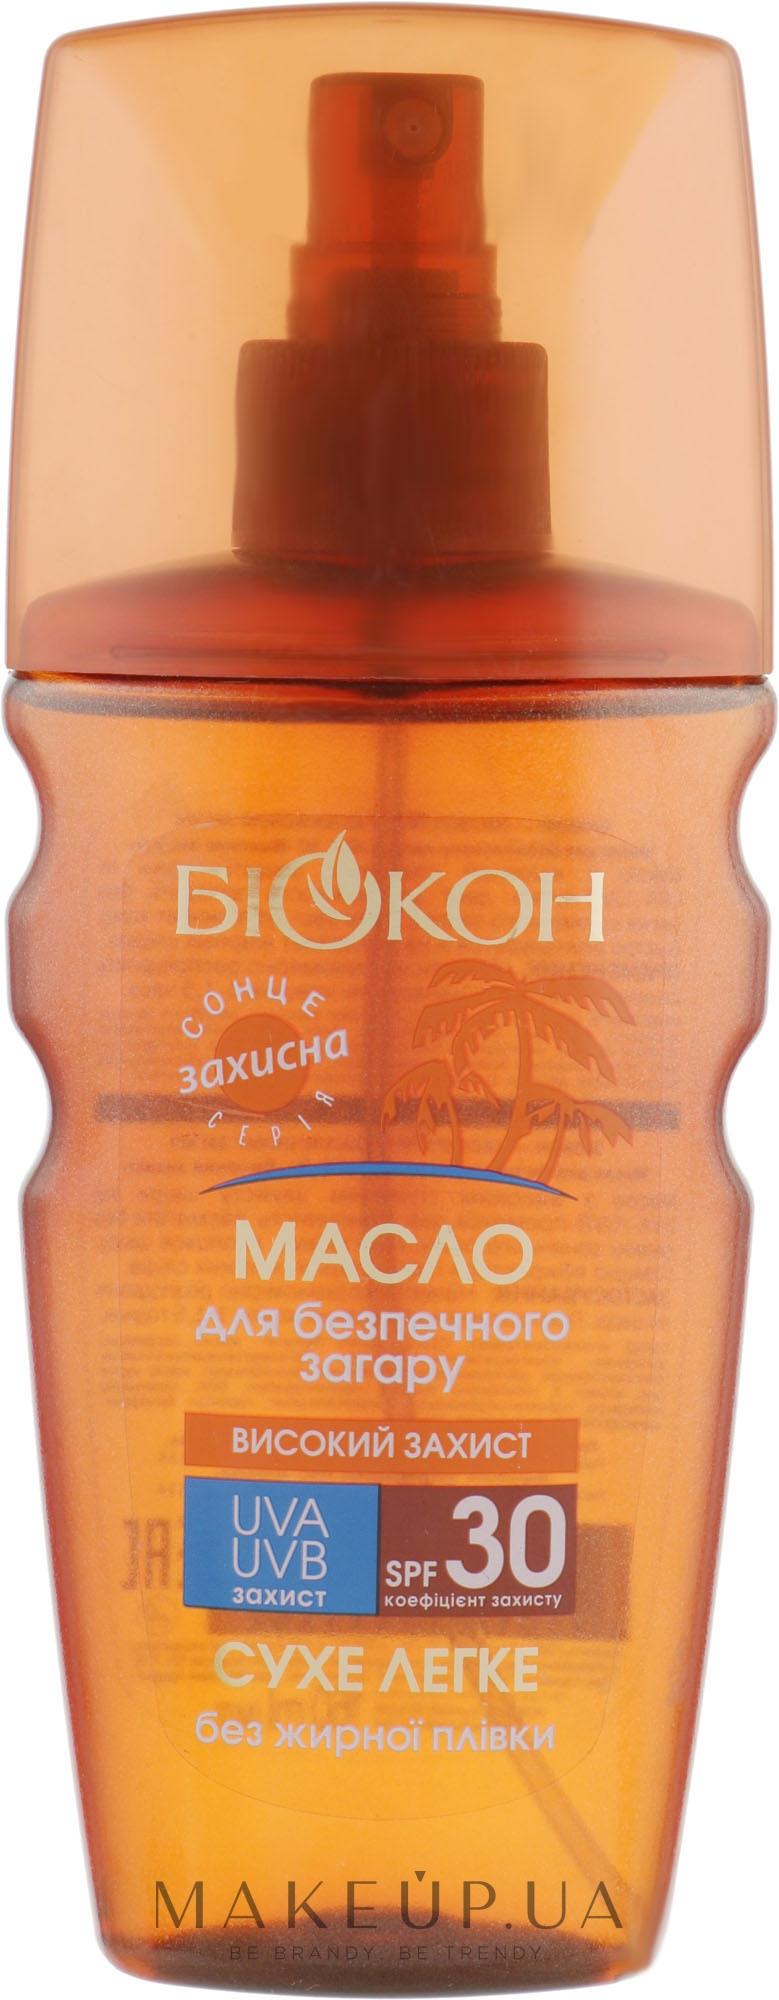 Масло для безпечної засмаги SPF-30 - Биокон — фото 160ml